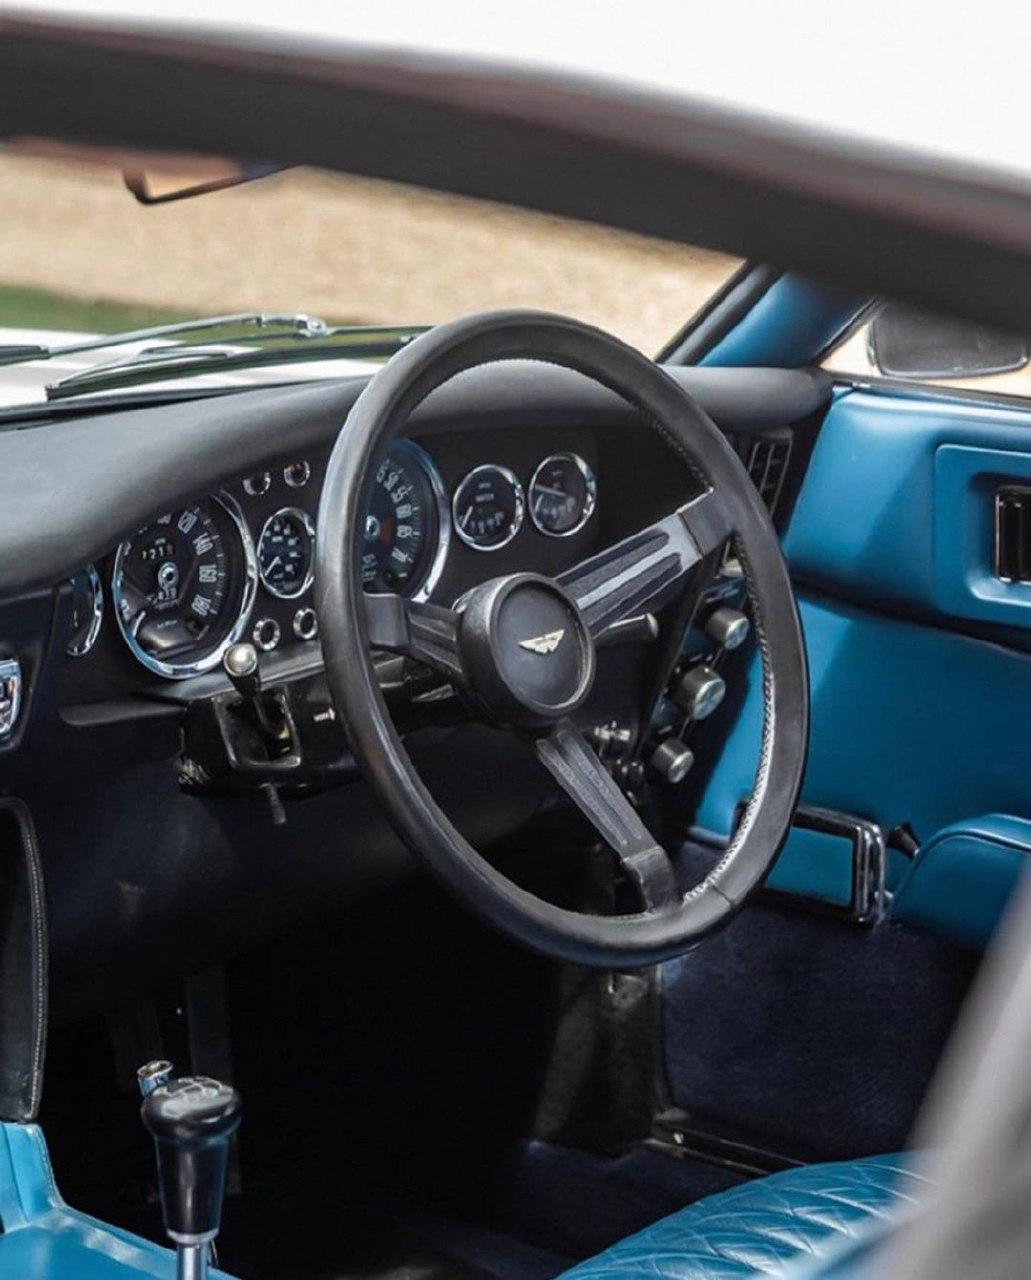 Aston Martin DBS 1970